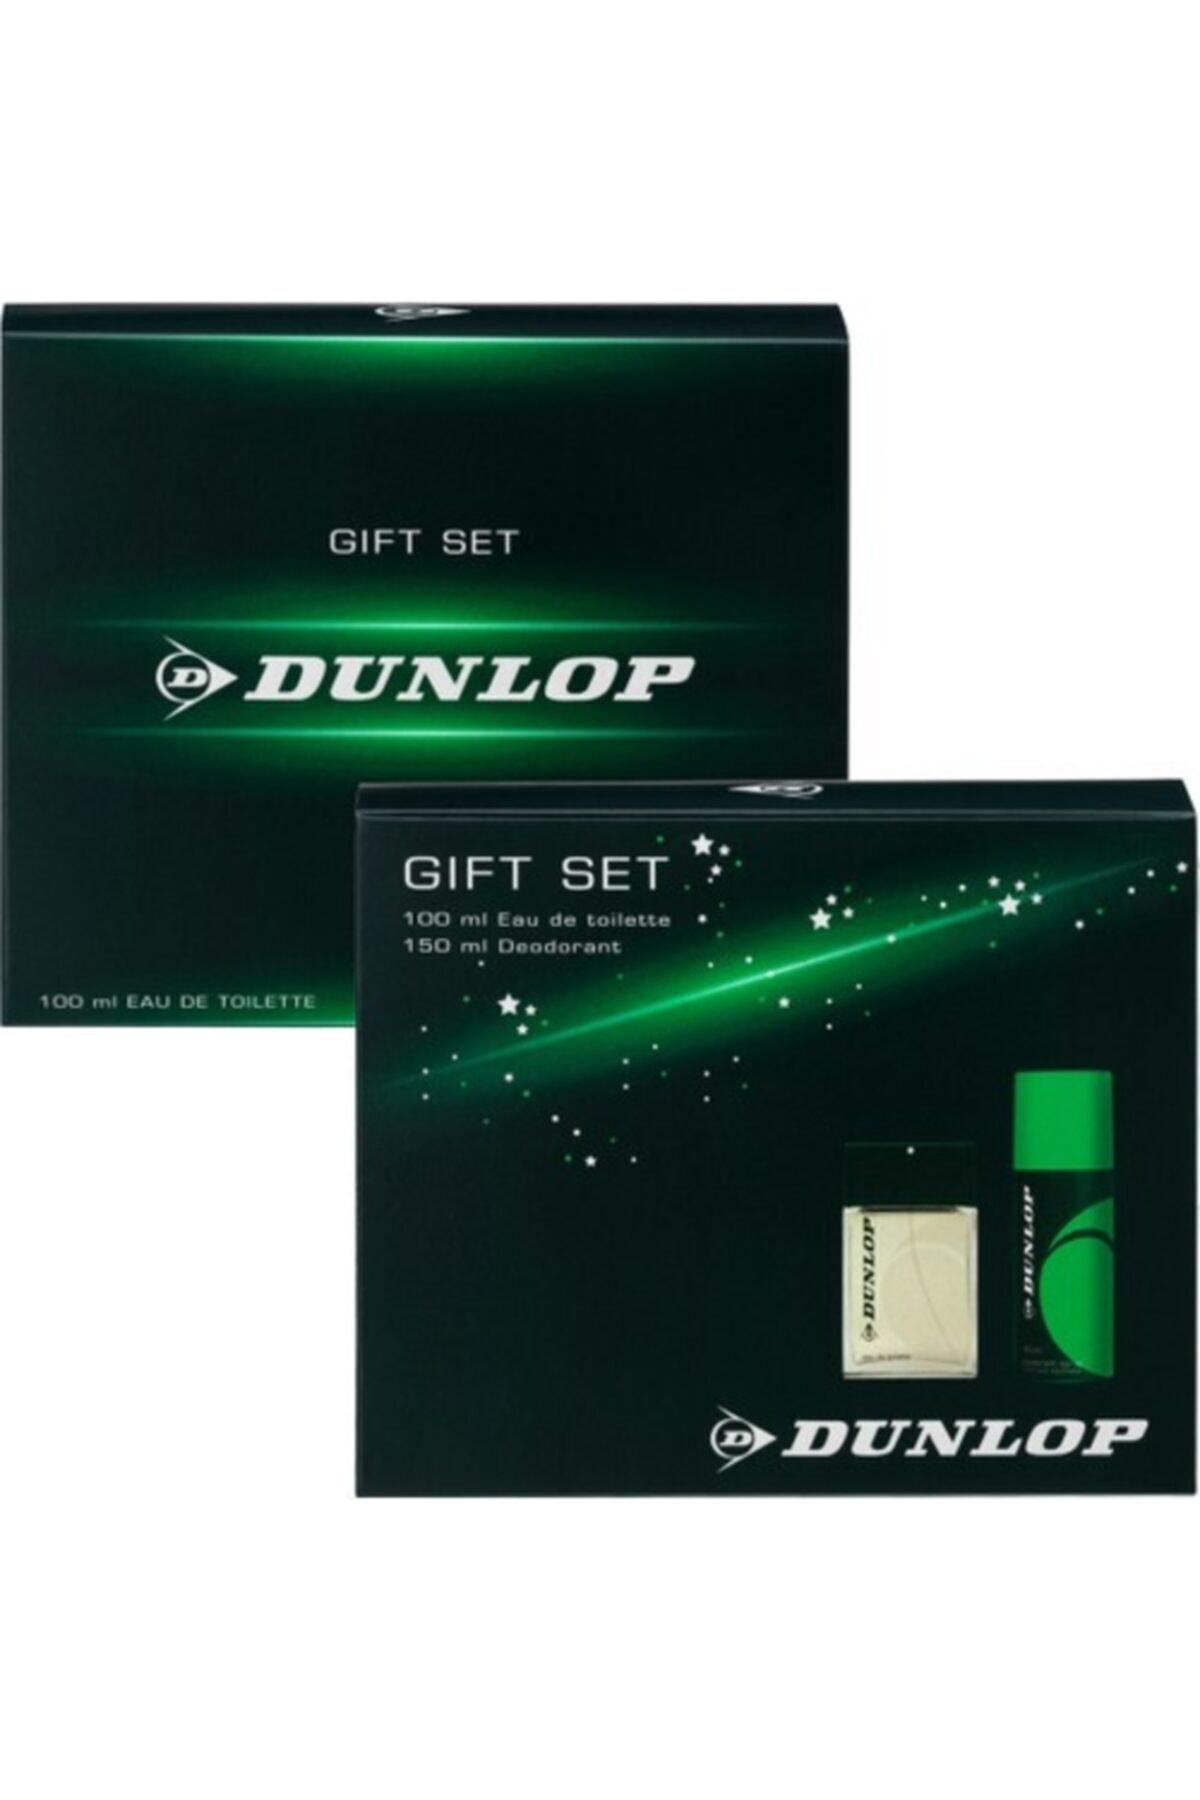 DUNLOP Edt 100 Ml Erkek Parfümü + 150 Ml Deodorant Set 1